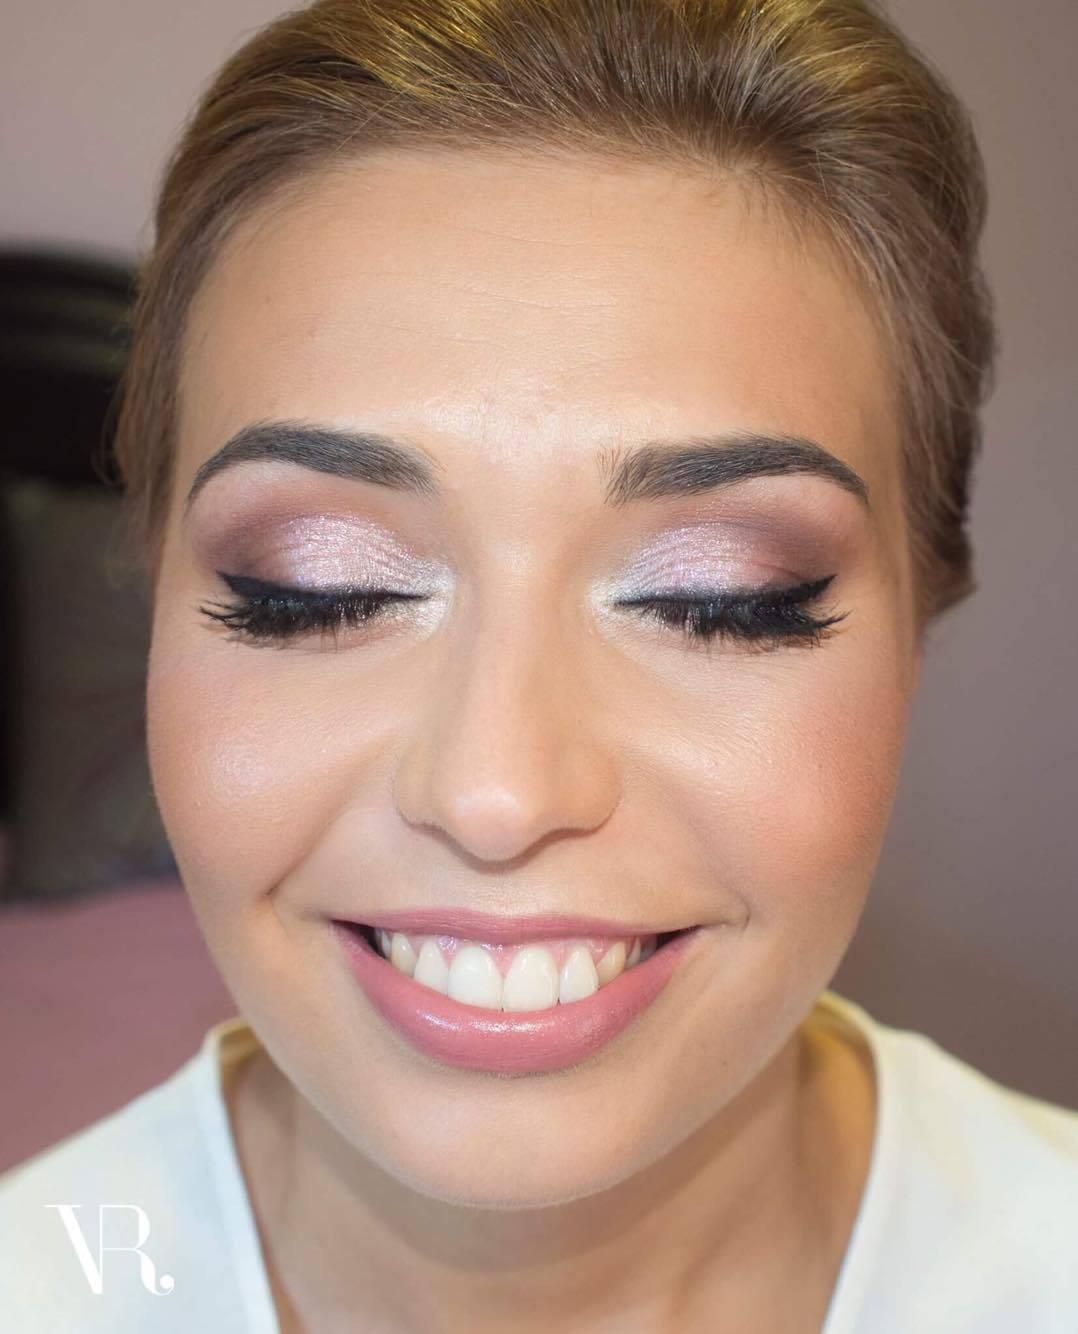 Maquilhagem de Noiva | Noiva Romântica em tons rosa